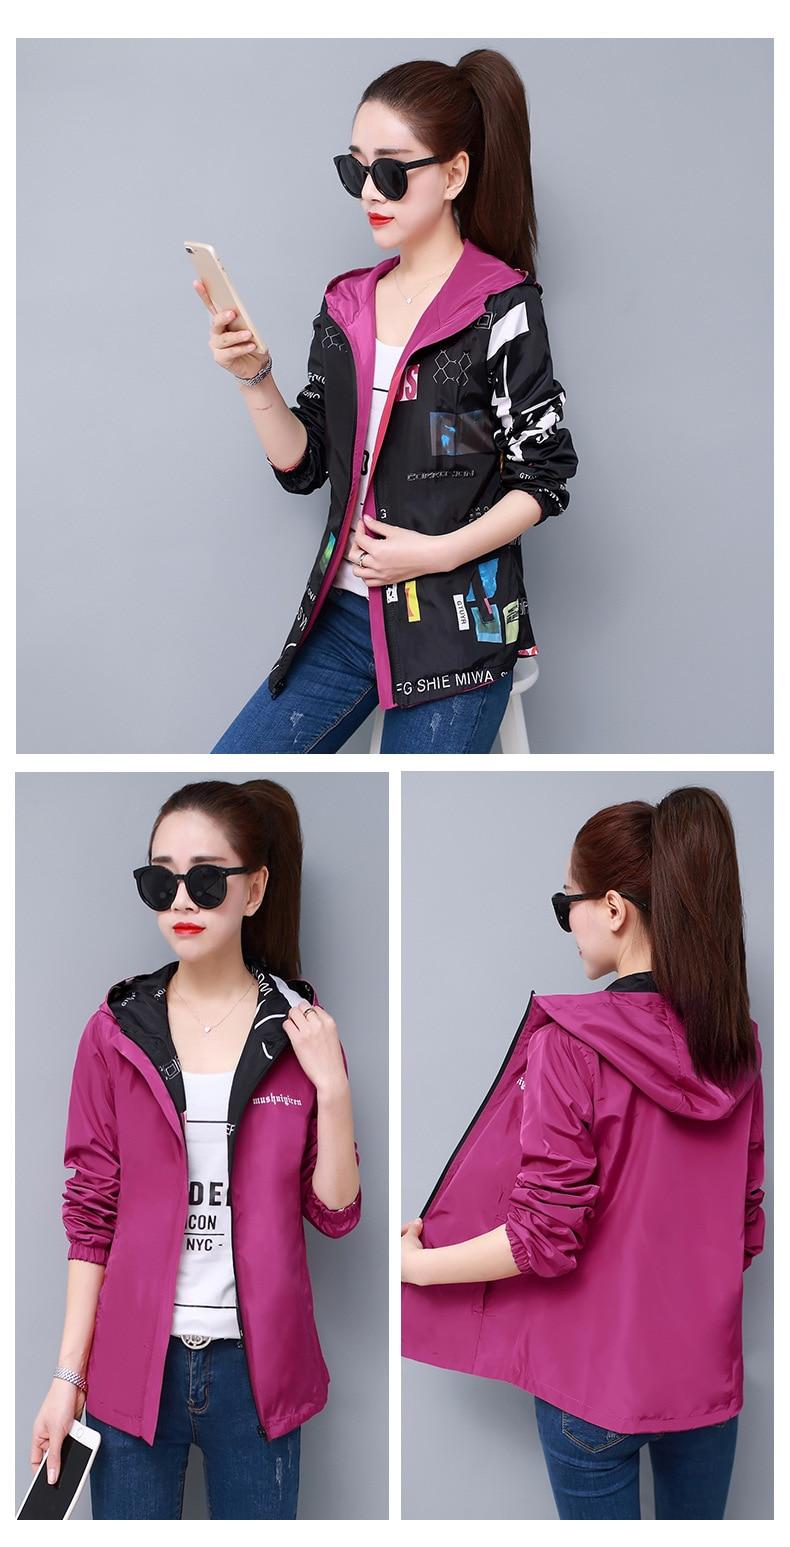 H7253e964f4dc494899eb81e285291210C Streetwear Hooded Printed jacket women And Causal windbreaker Basic Jackets 2019 New Reversible baseball Zippers jacket 4XL